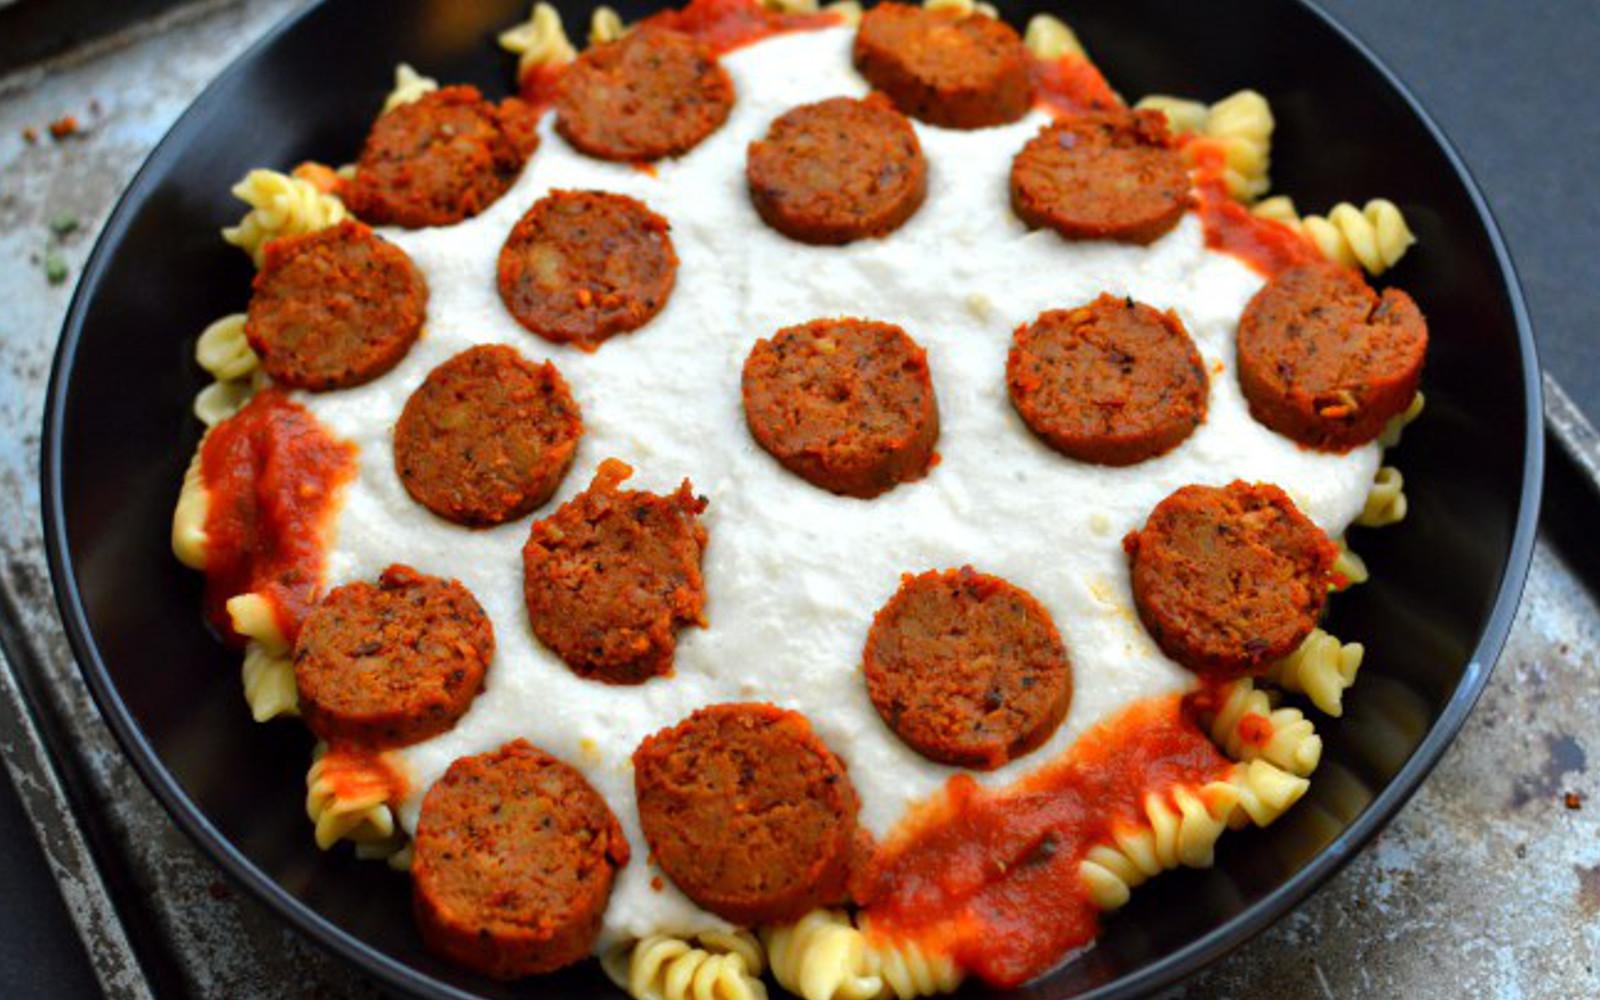 Pepperoni Pizza Pasta With Homemade Mozzarella [Vegan, Gluten-Free]